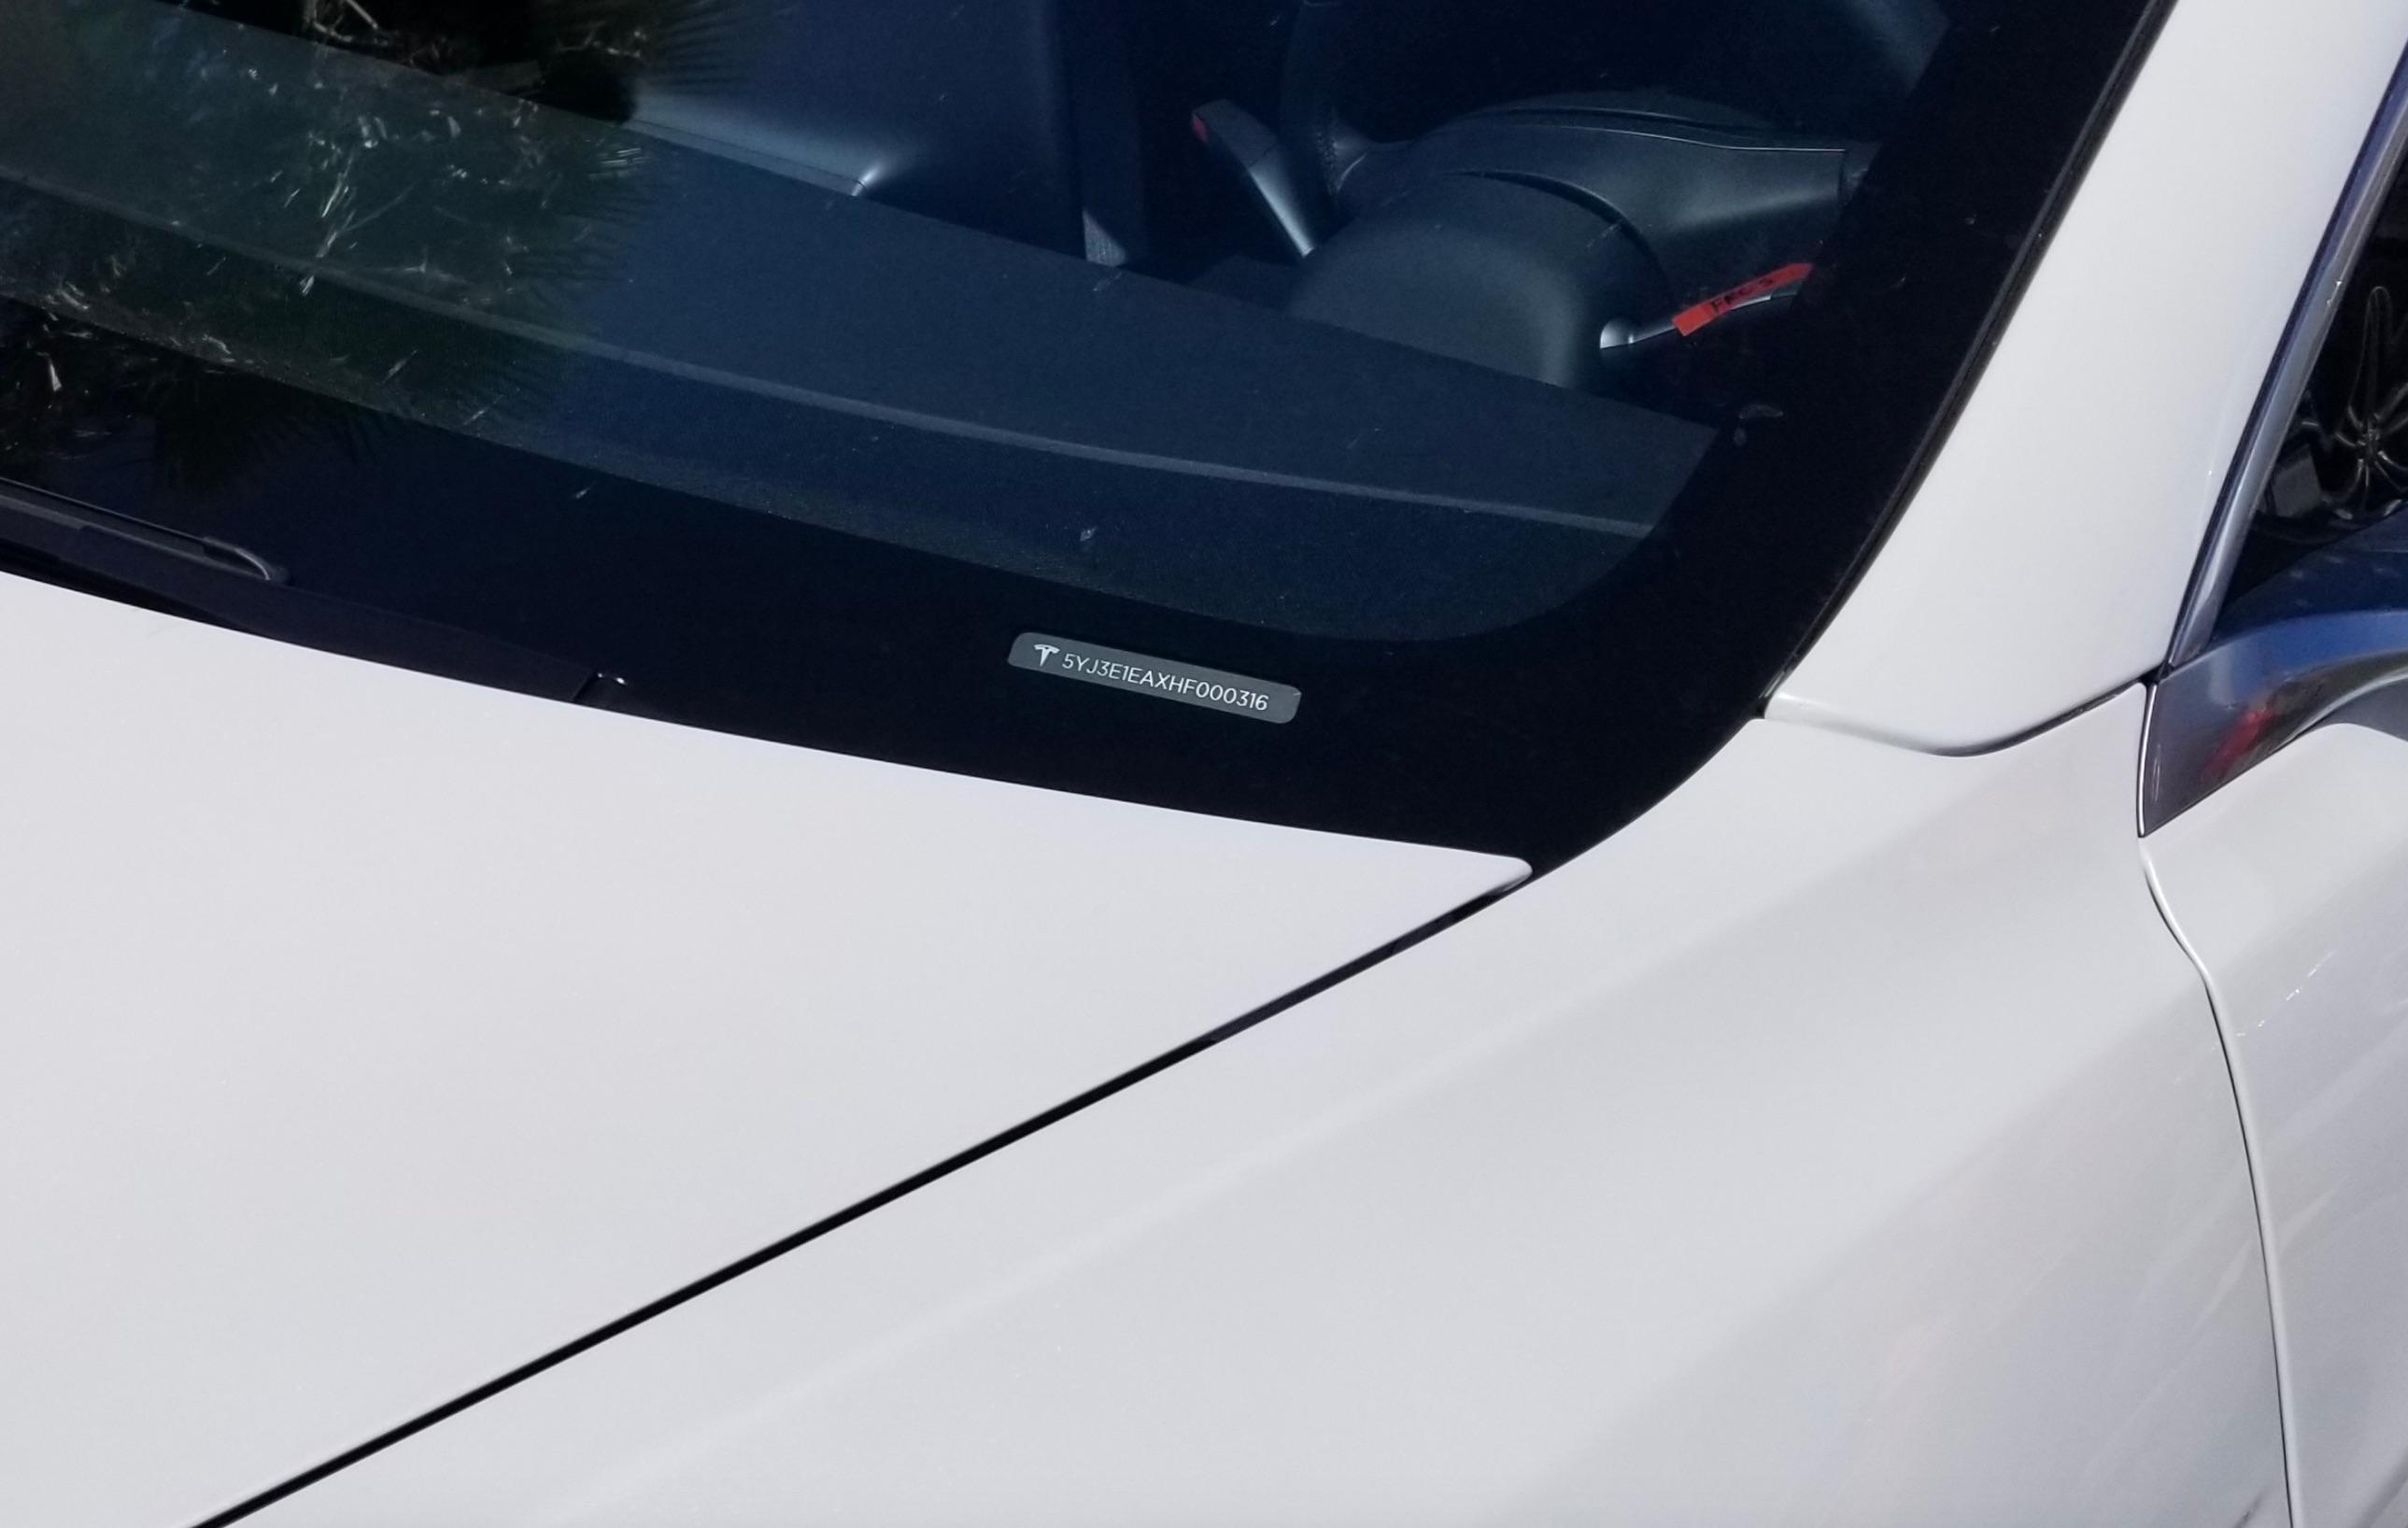 Here S How You Decode The Tesla Model 3 Vin